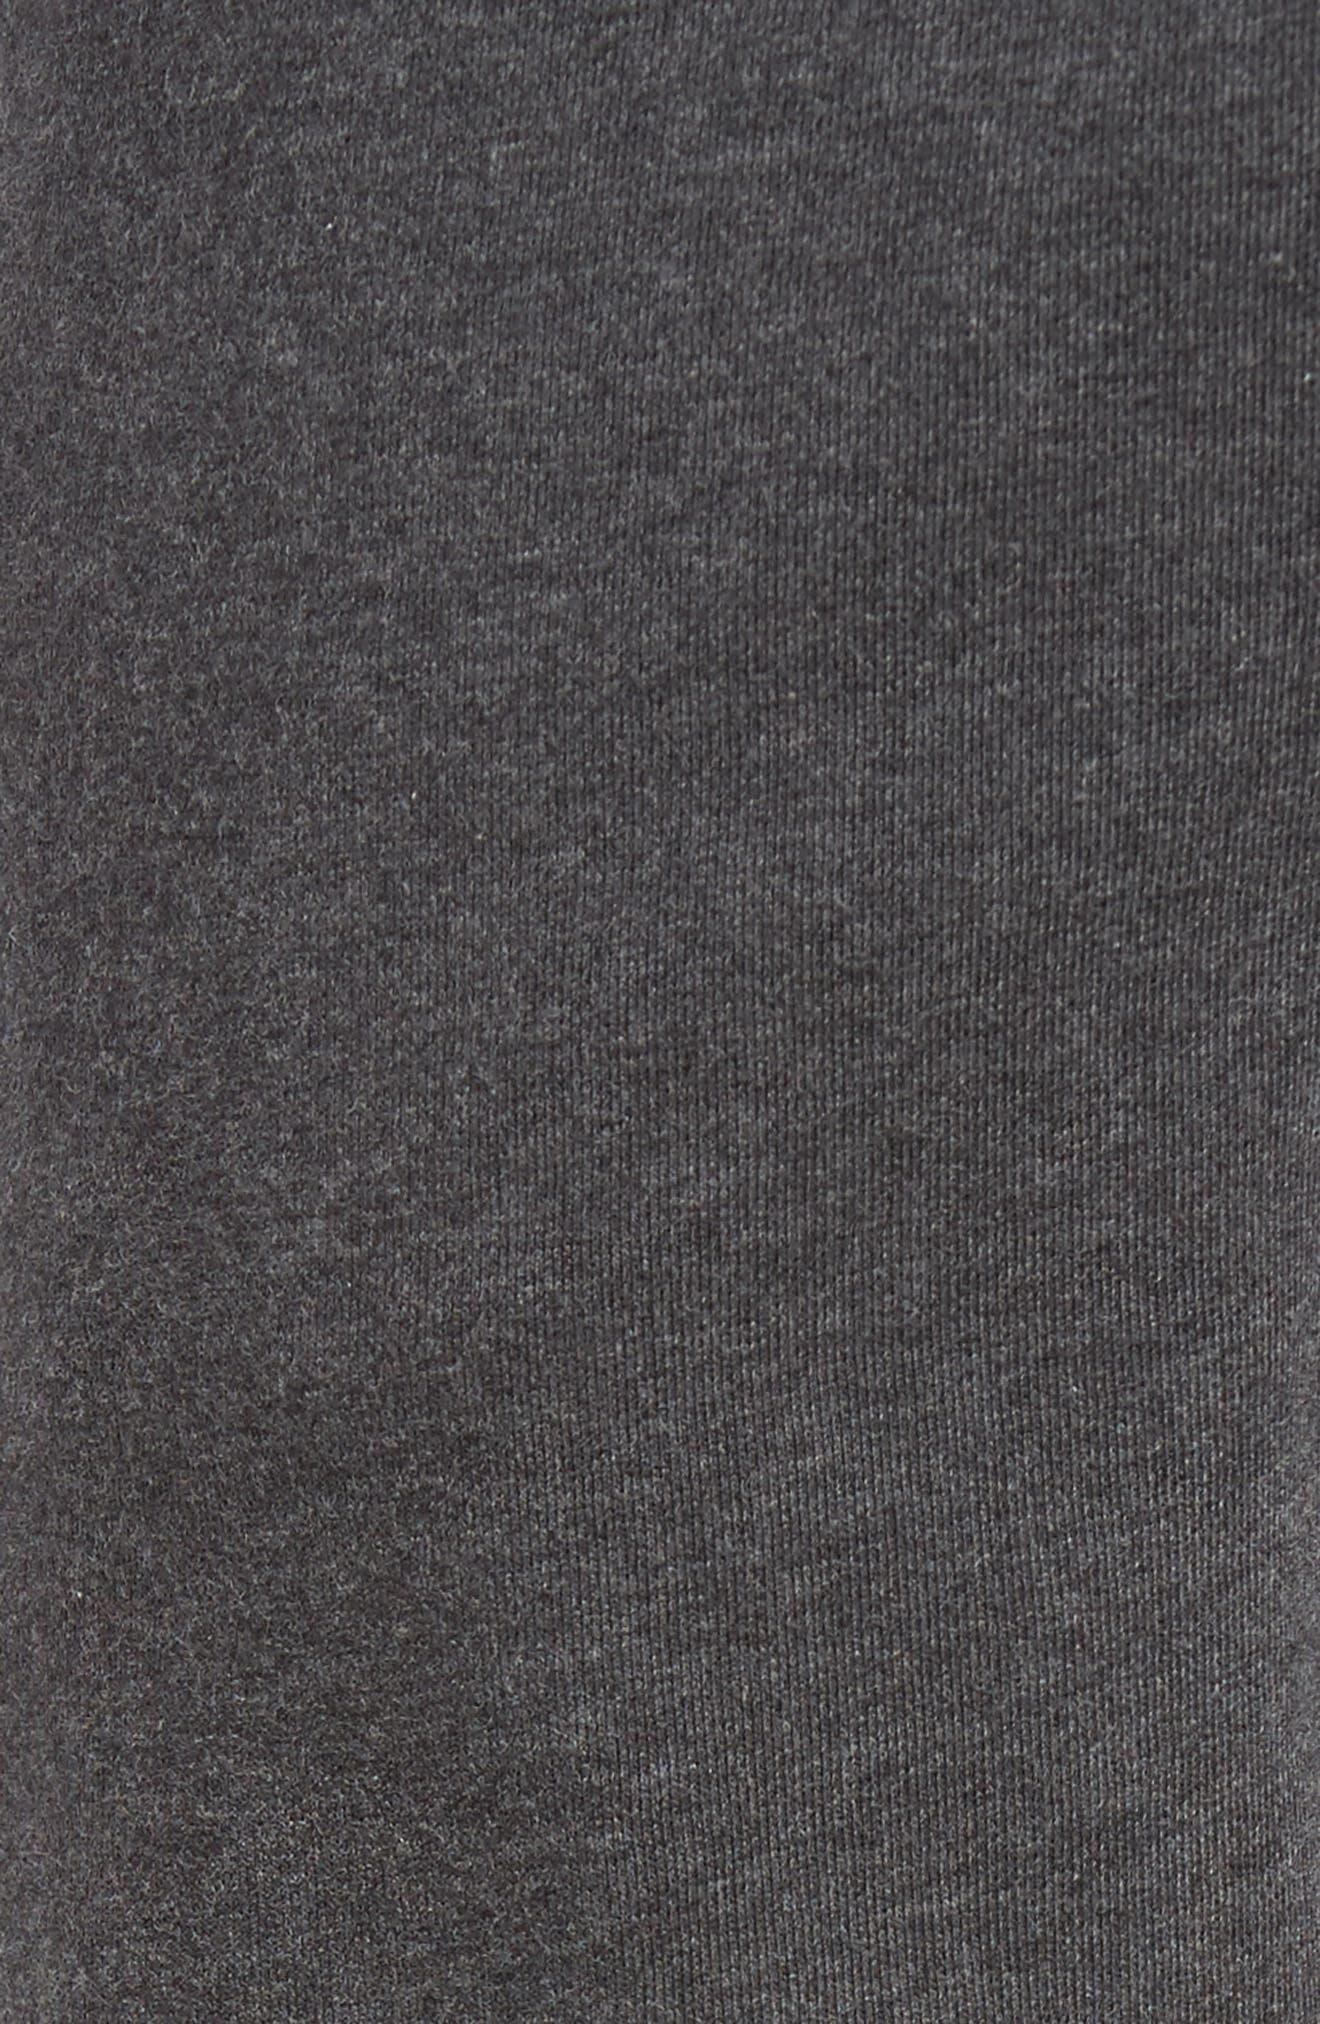 Slim Fit Sweatpants,                             Alternate thumbnail 22, color,